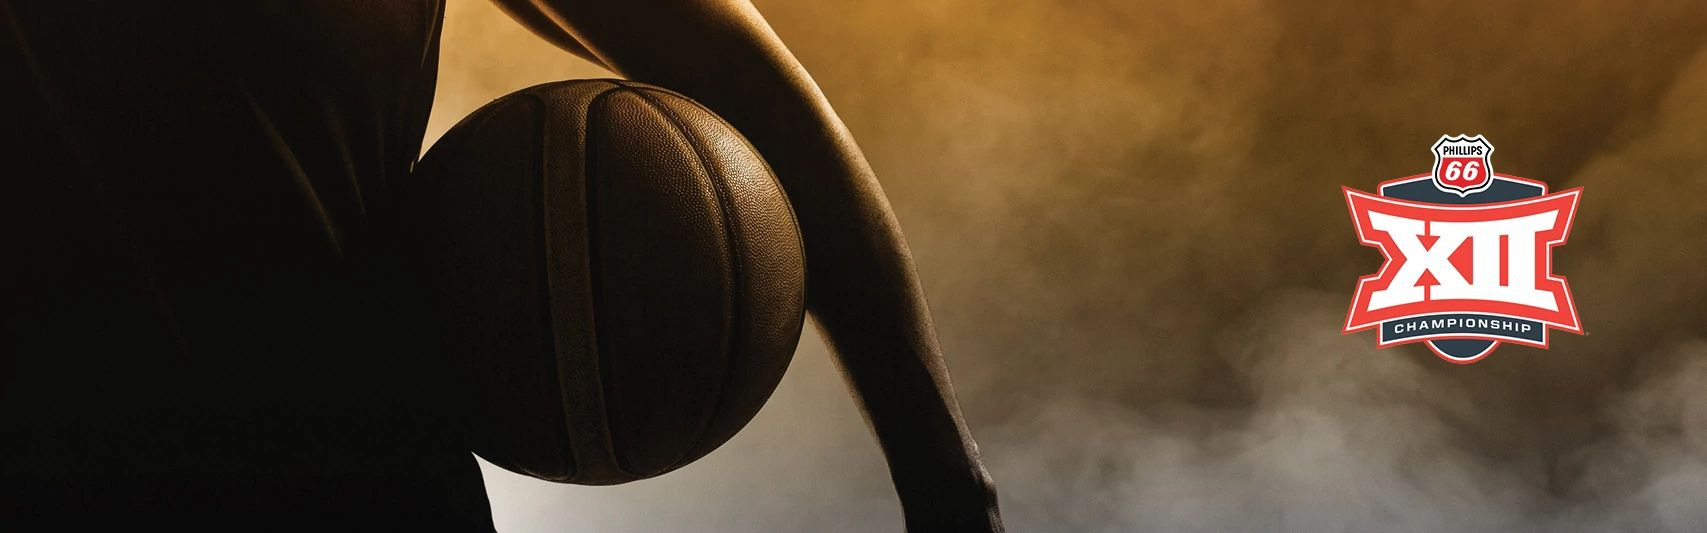 21-0020_014_Big12_Basketball banner 3-16.jpg